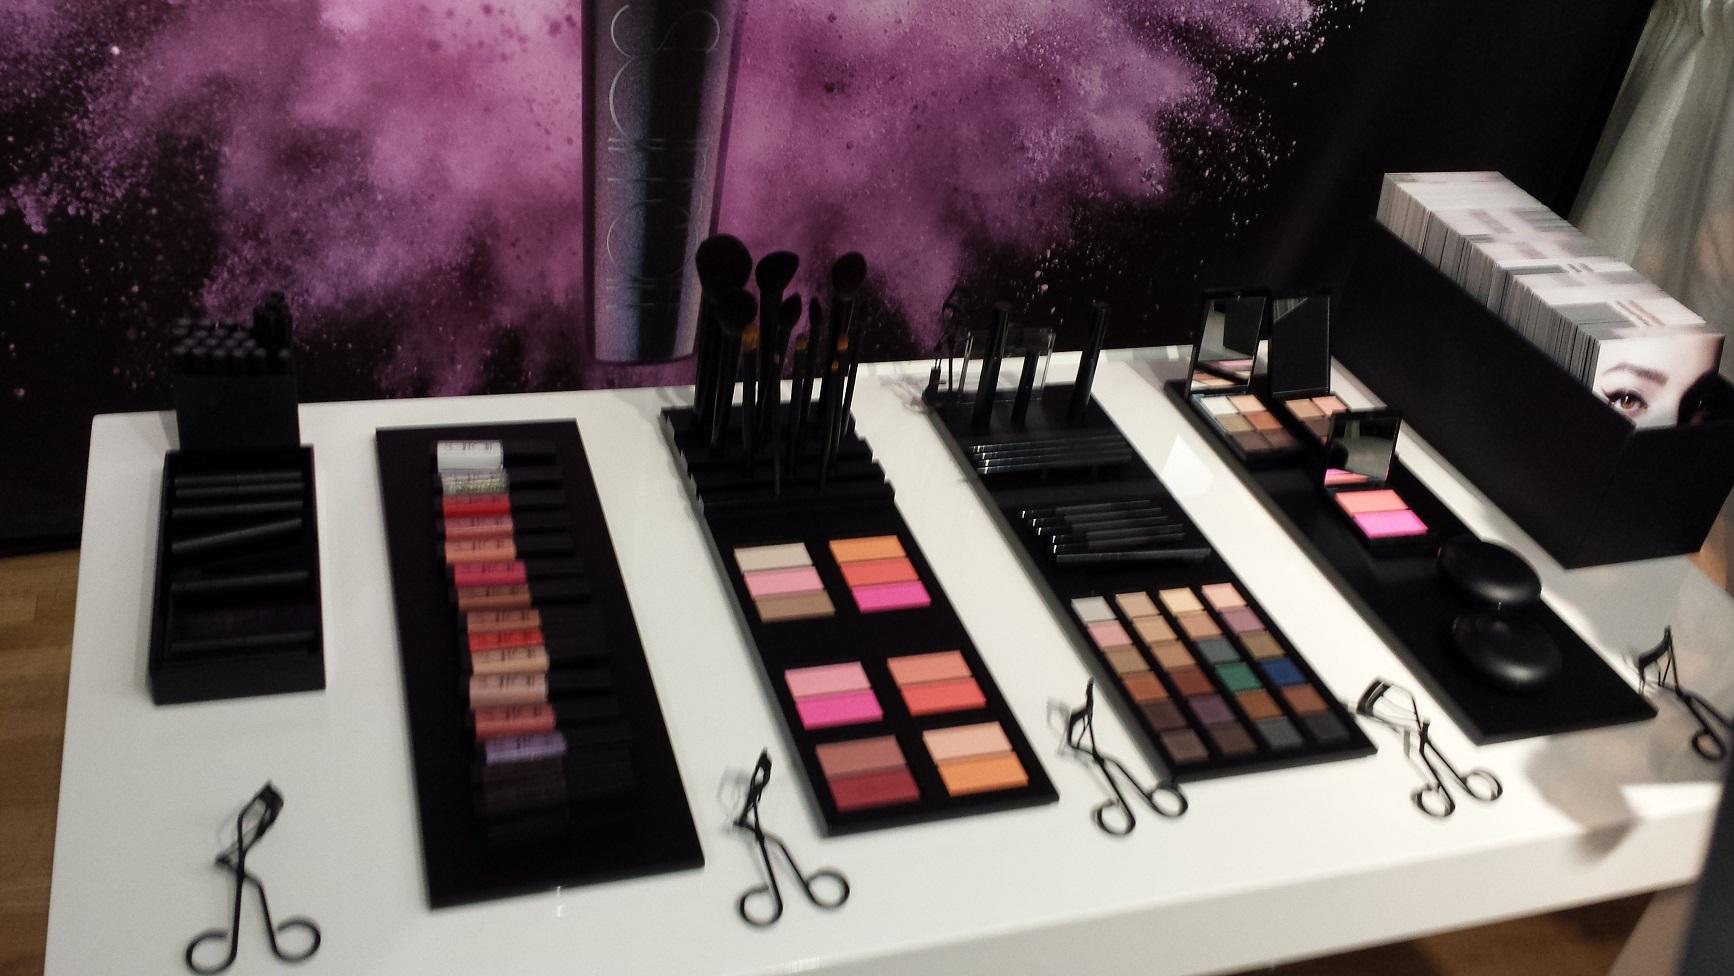 How To Get Discounts On Mac Makeup